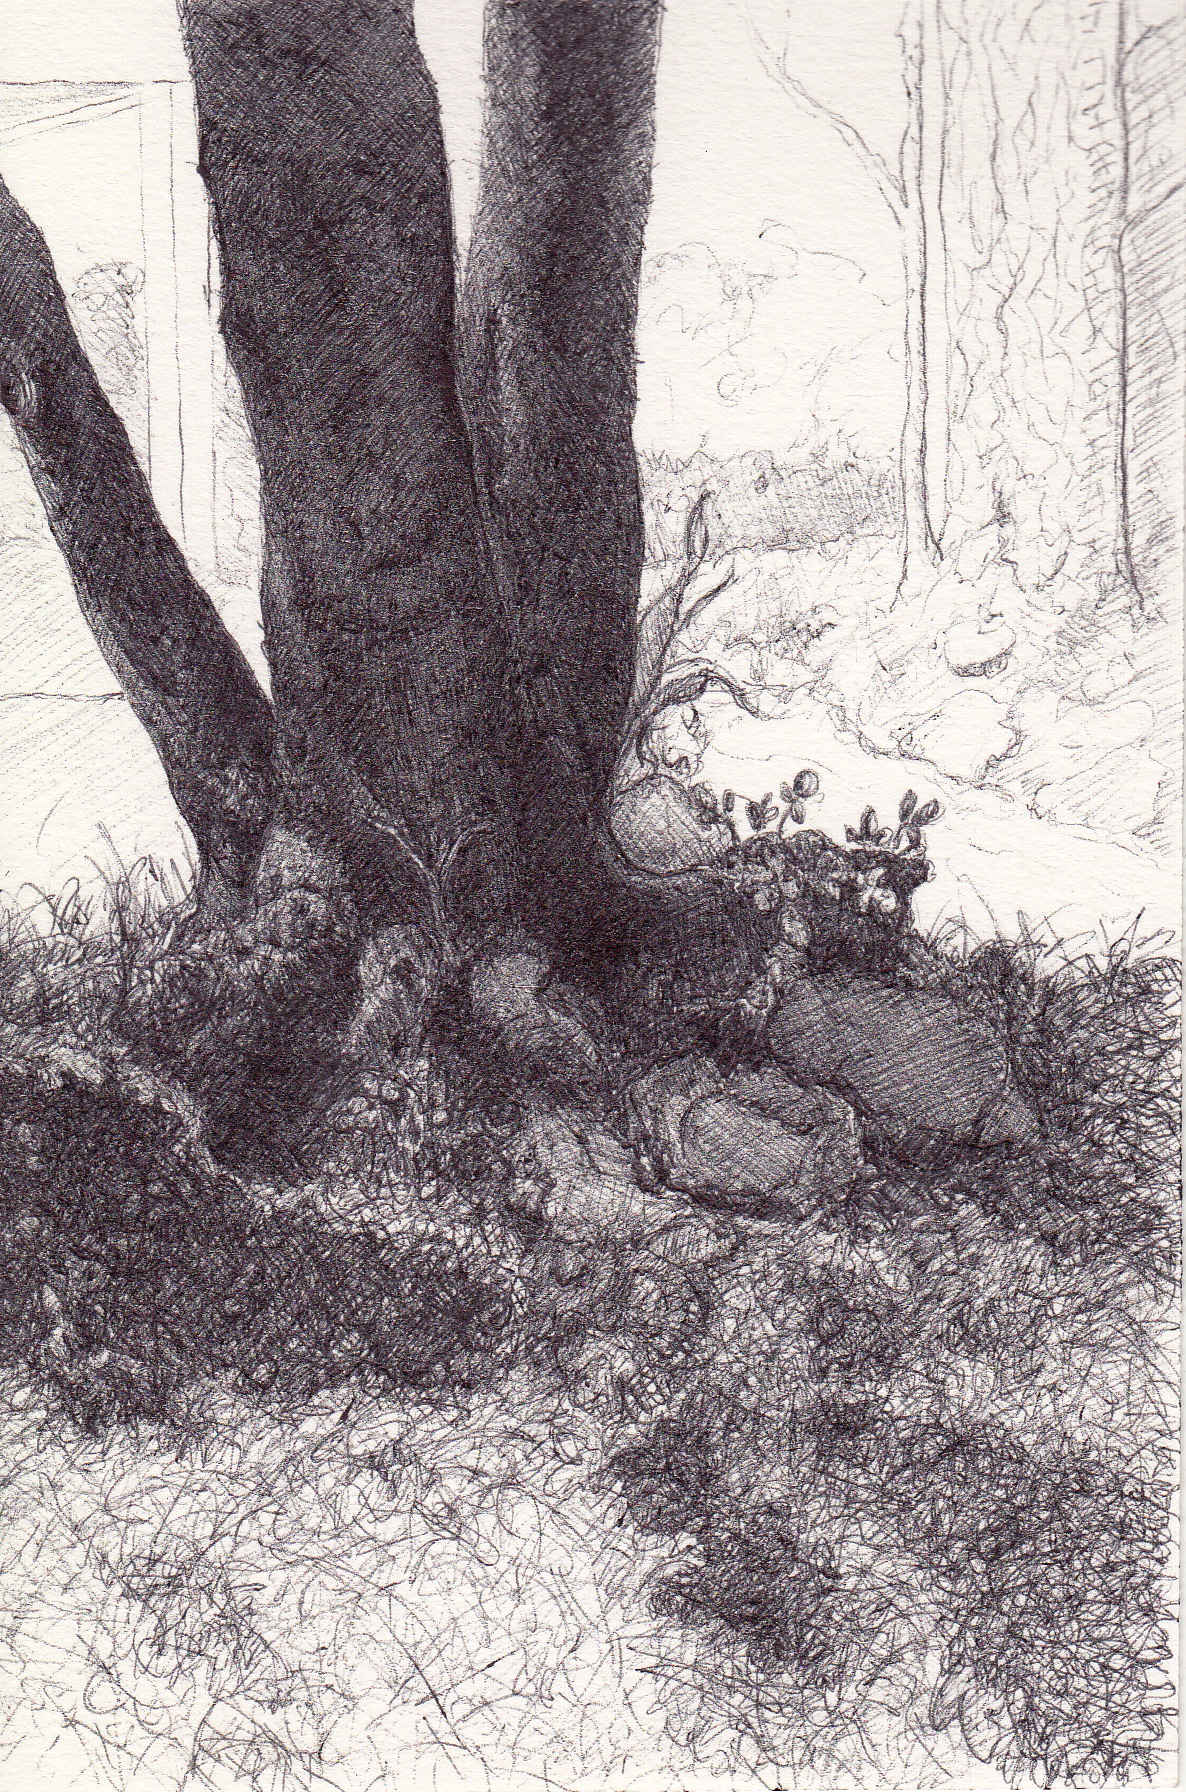 "Rosie's Tree, 4"" 6"", ball point pen, 2014"